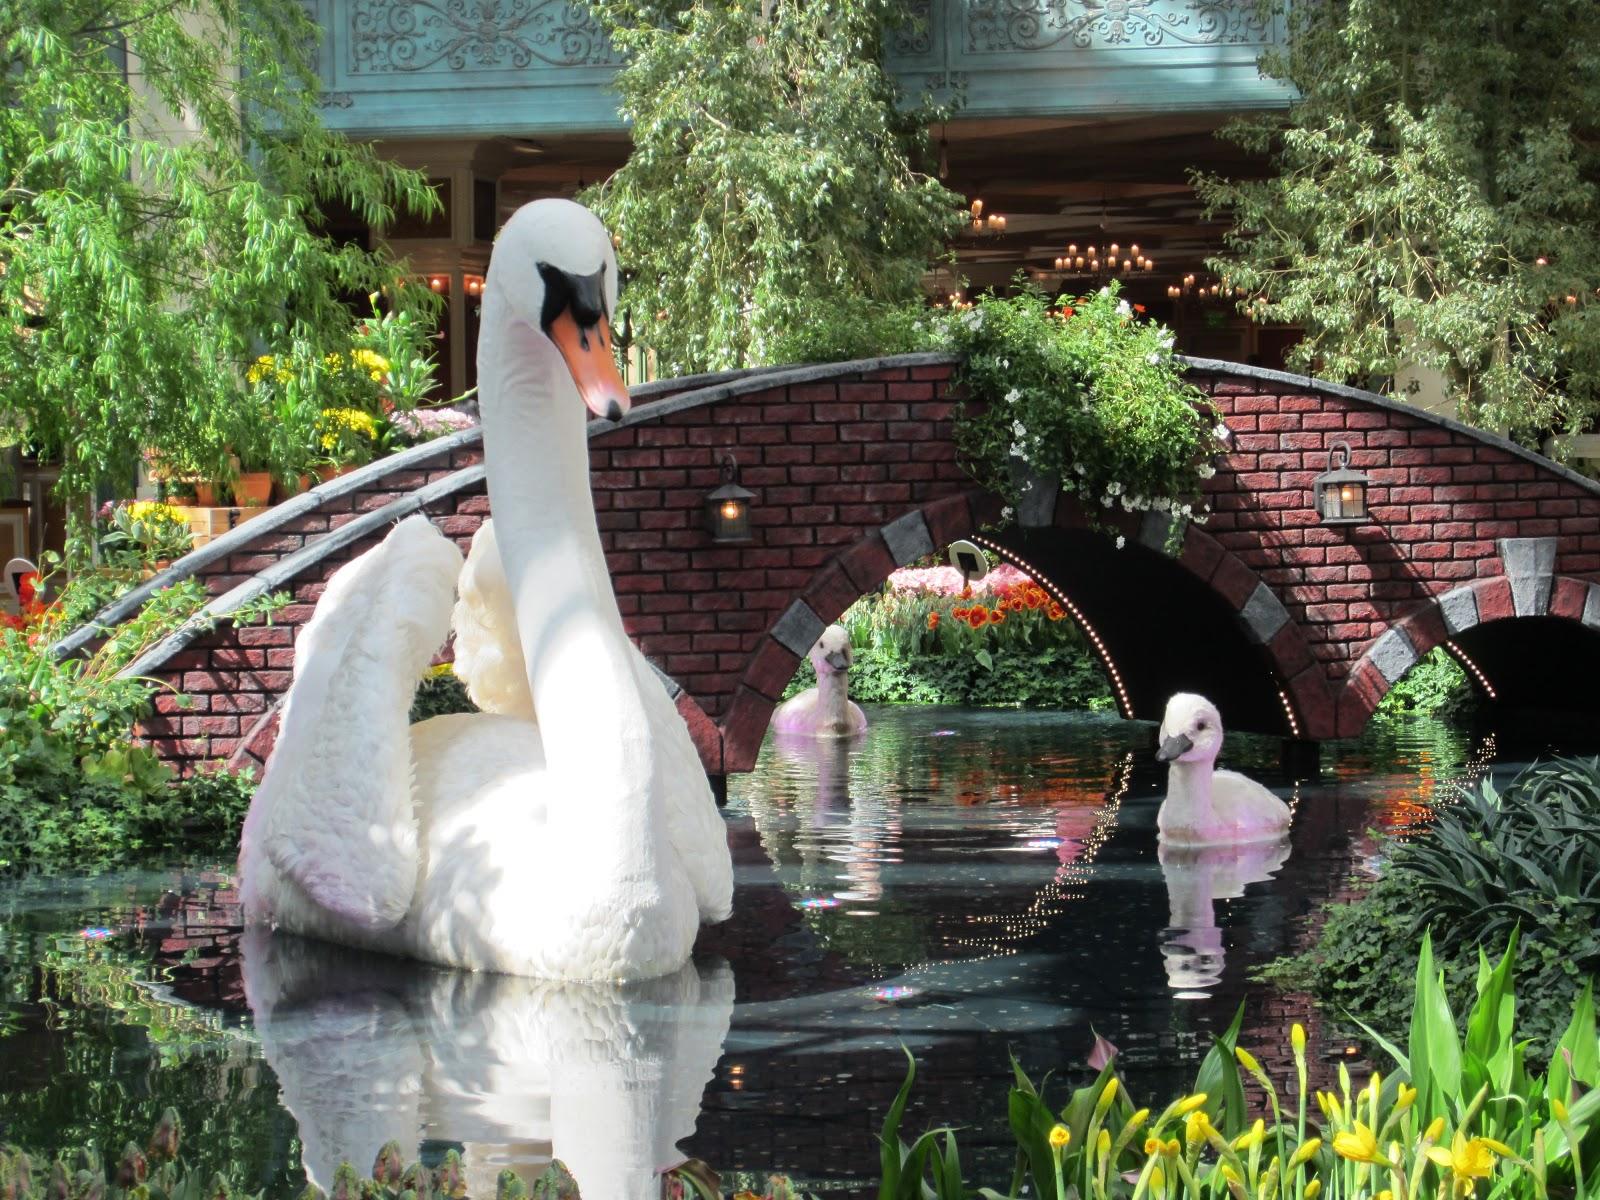 las vegas hotels to see